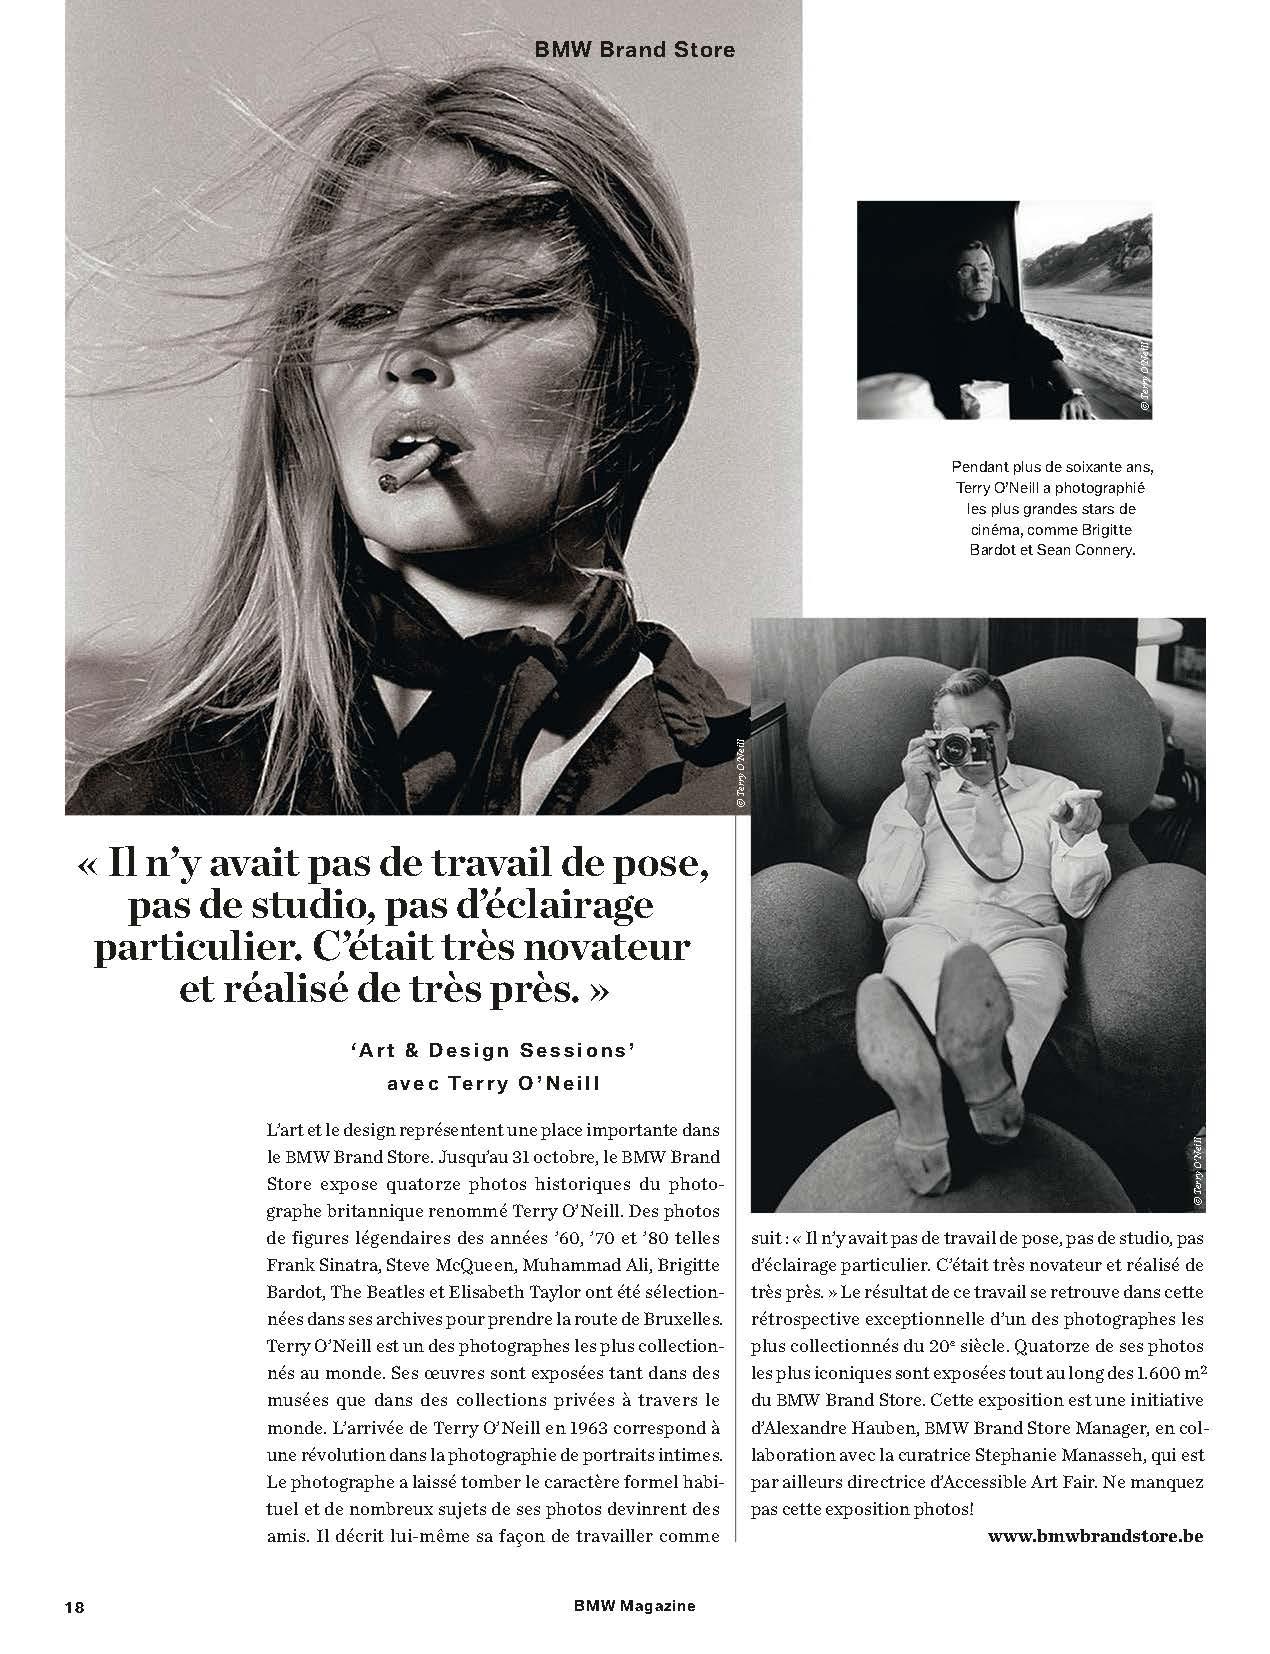 BMW Magazine - Terry O'Neill at Ransom Art